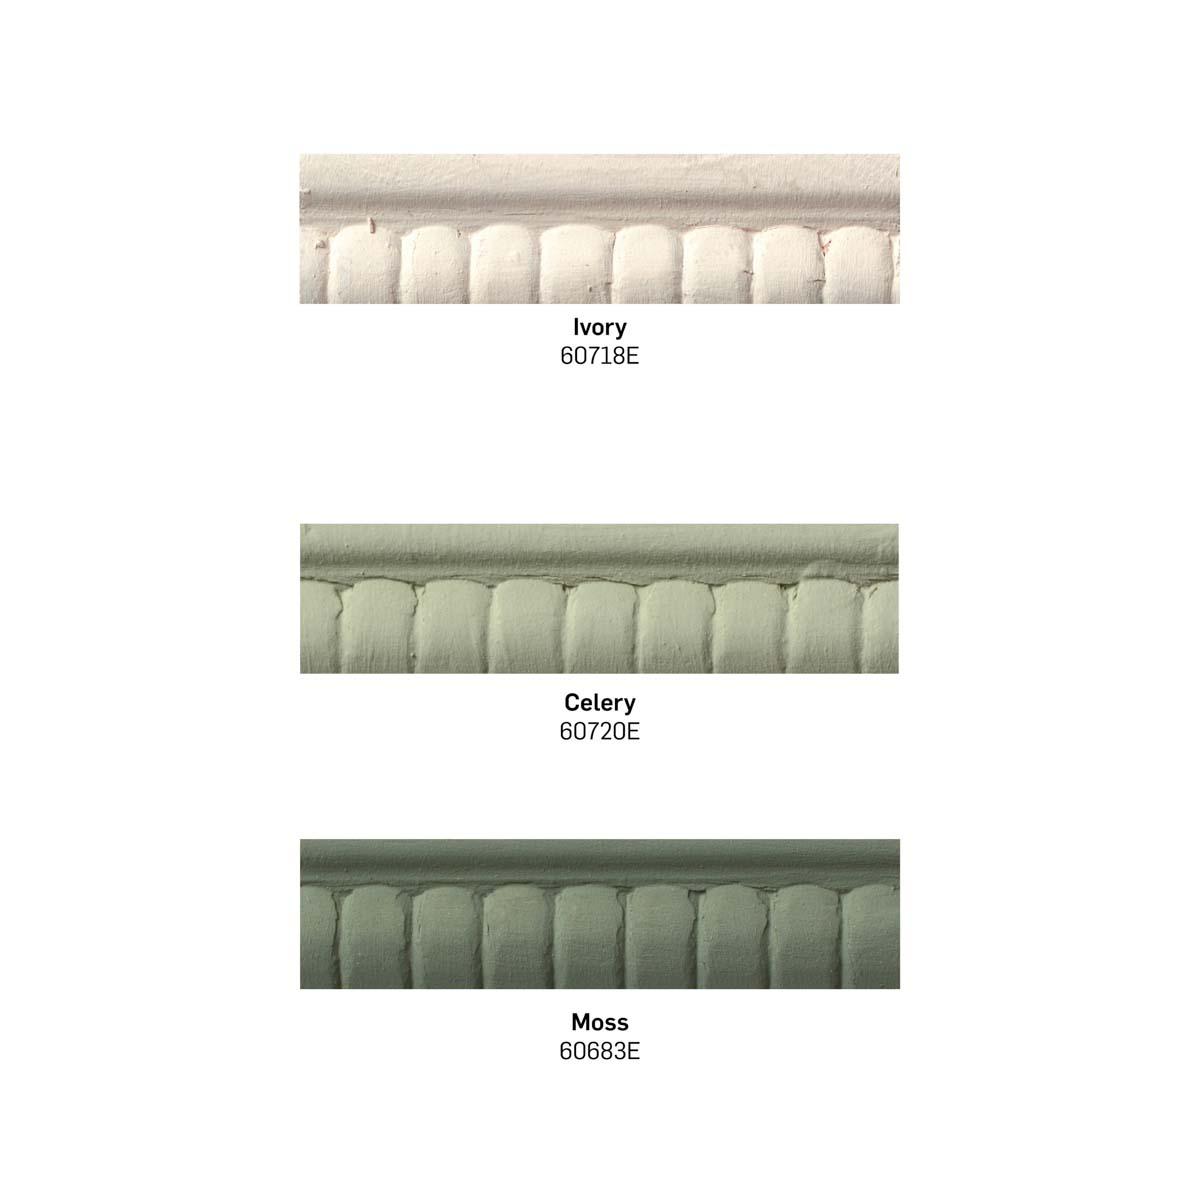 Waverly ® Inspirations Chalk Finish Acrylic Paint Set - Greens, 3 pc. - 13408